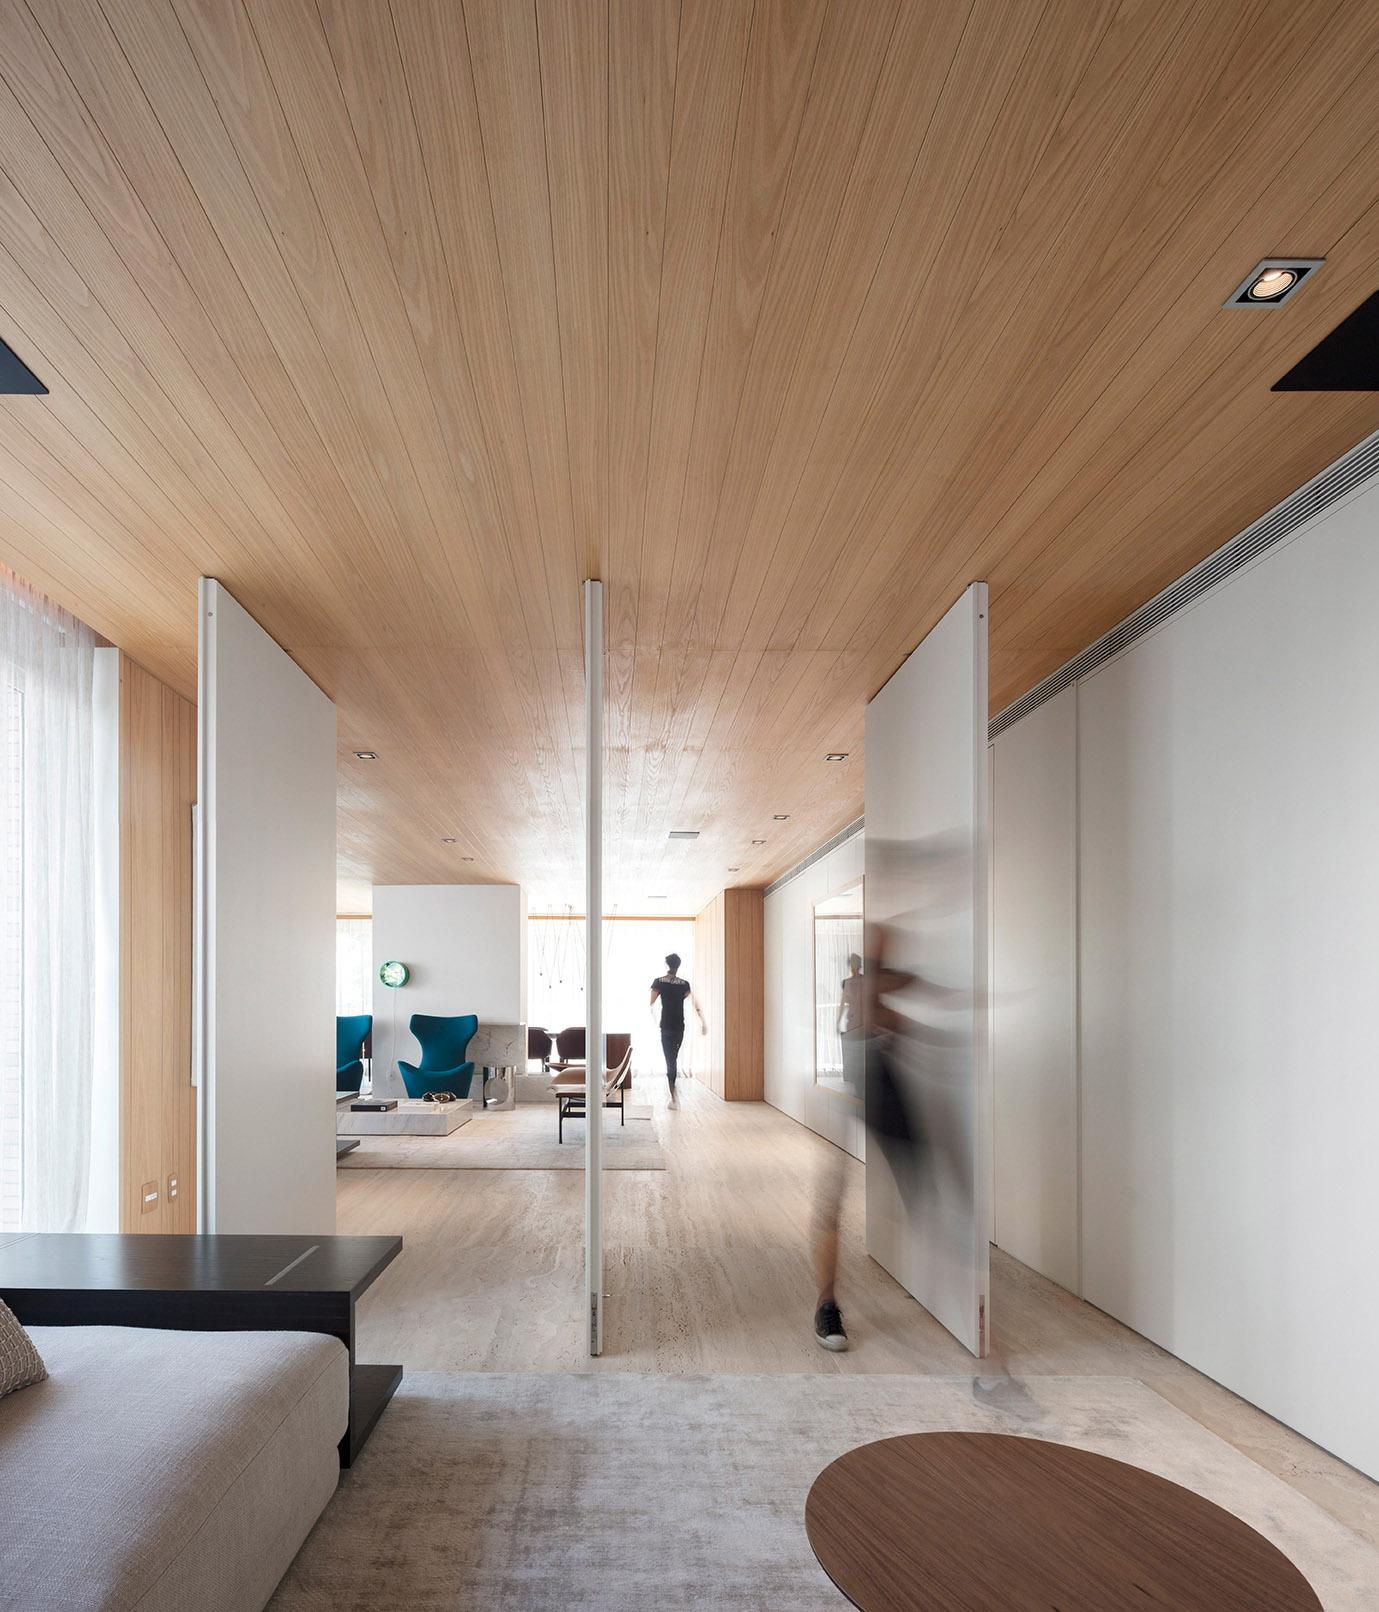 projeto eretz-fernanda marques arquiteta 12.jpg